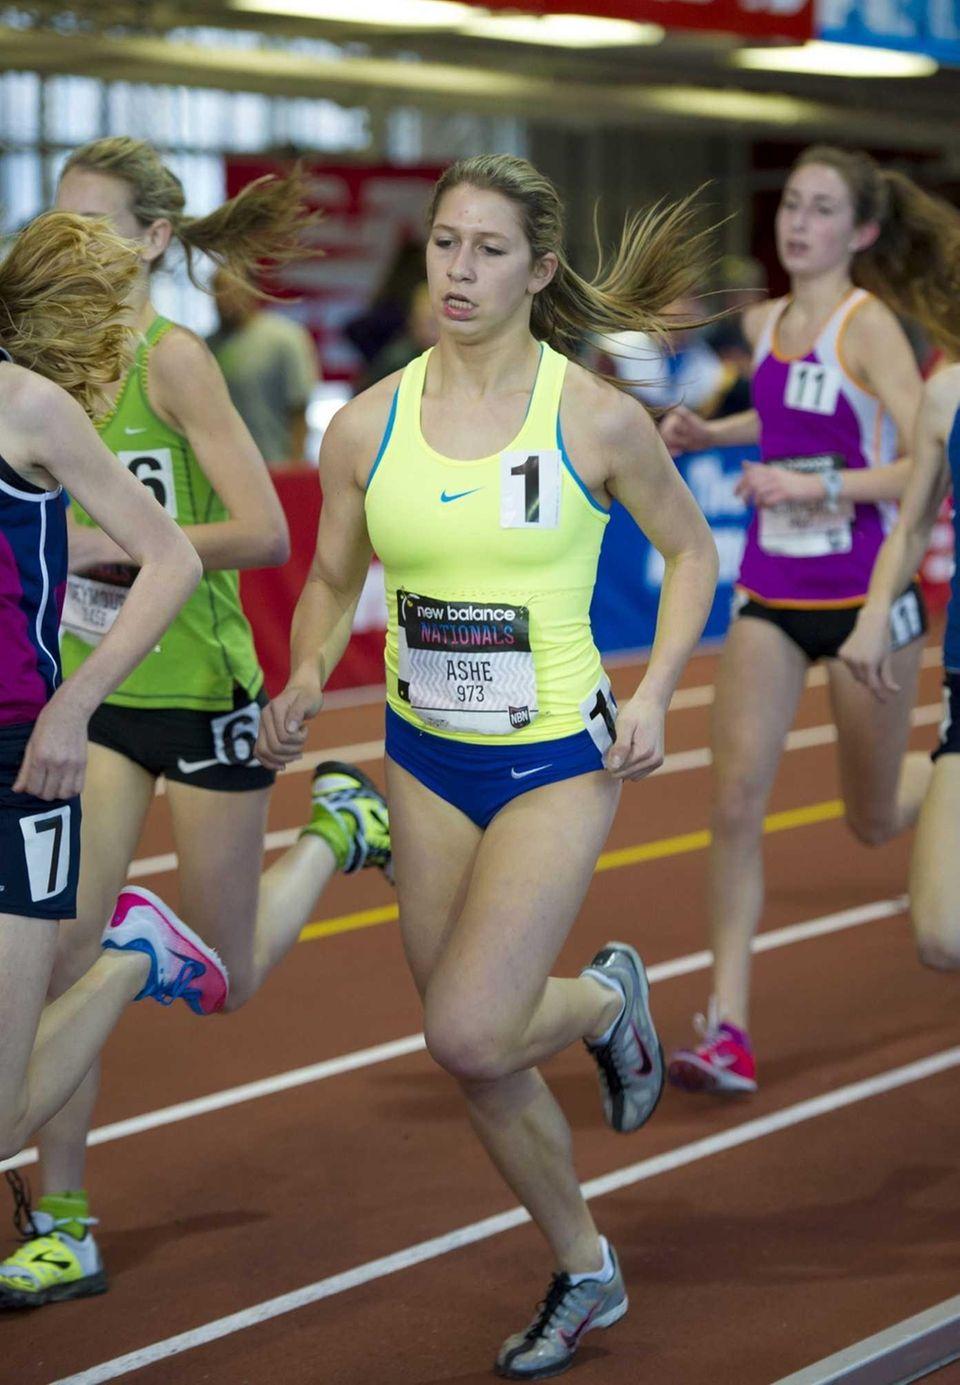 Amanda Ashe of East Meadow ran 11:26.43 to